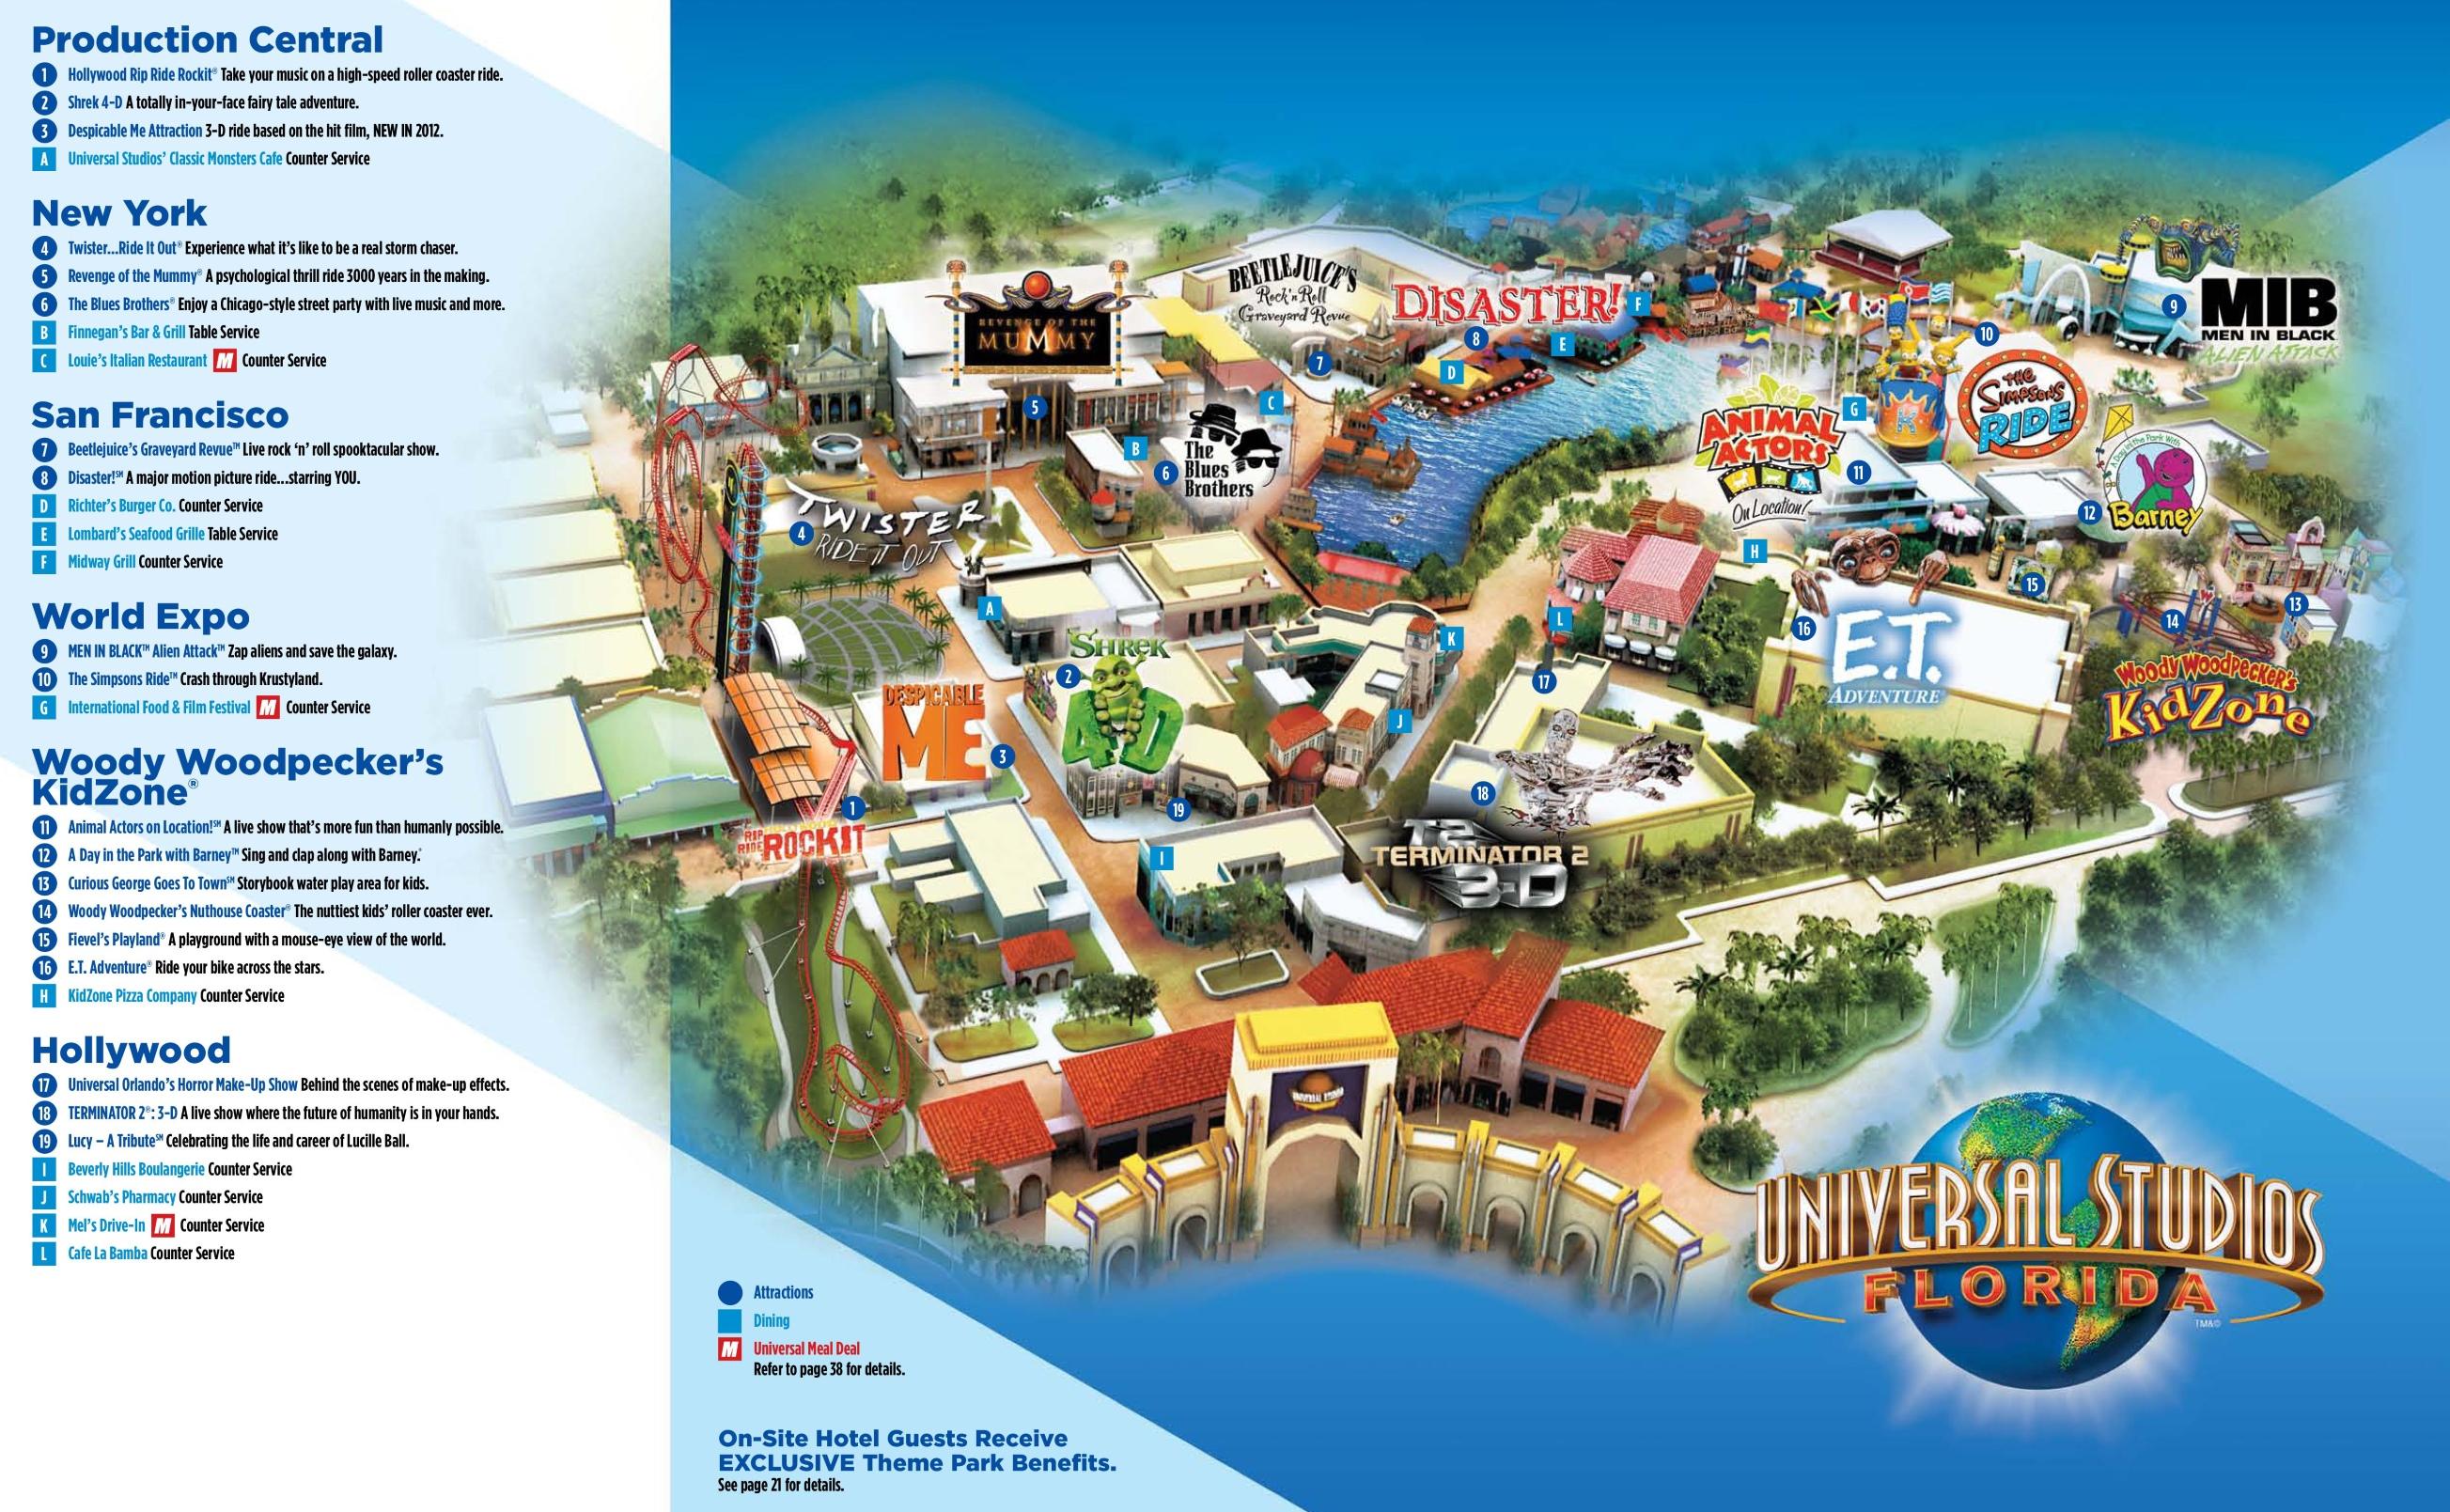 Universal Studios Florida Map Orlando Universal Studios Florida map